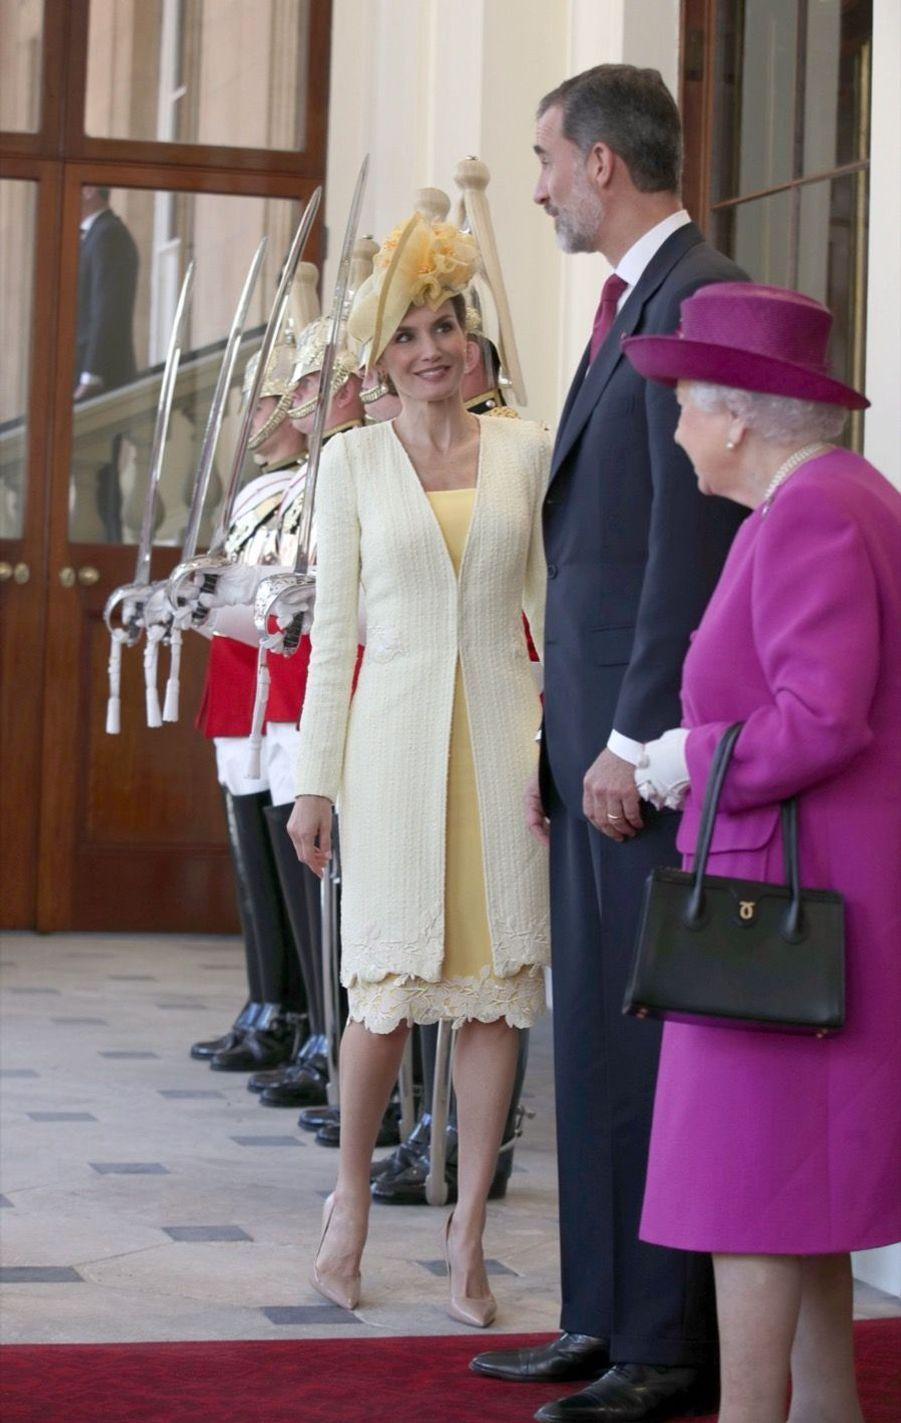 Letizia Et Felipe En Visite Chez La Reine Elizabeth II 7